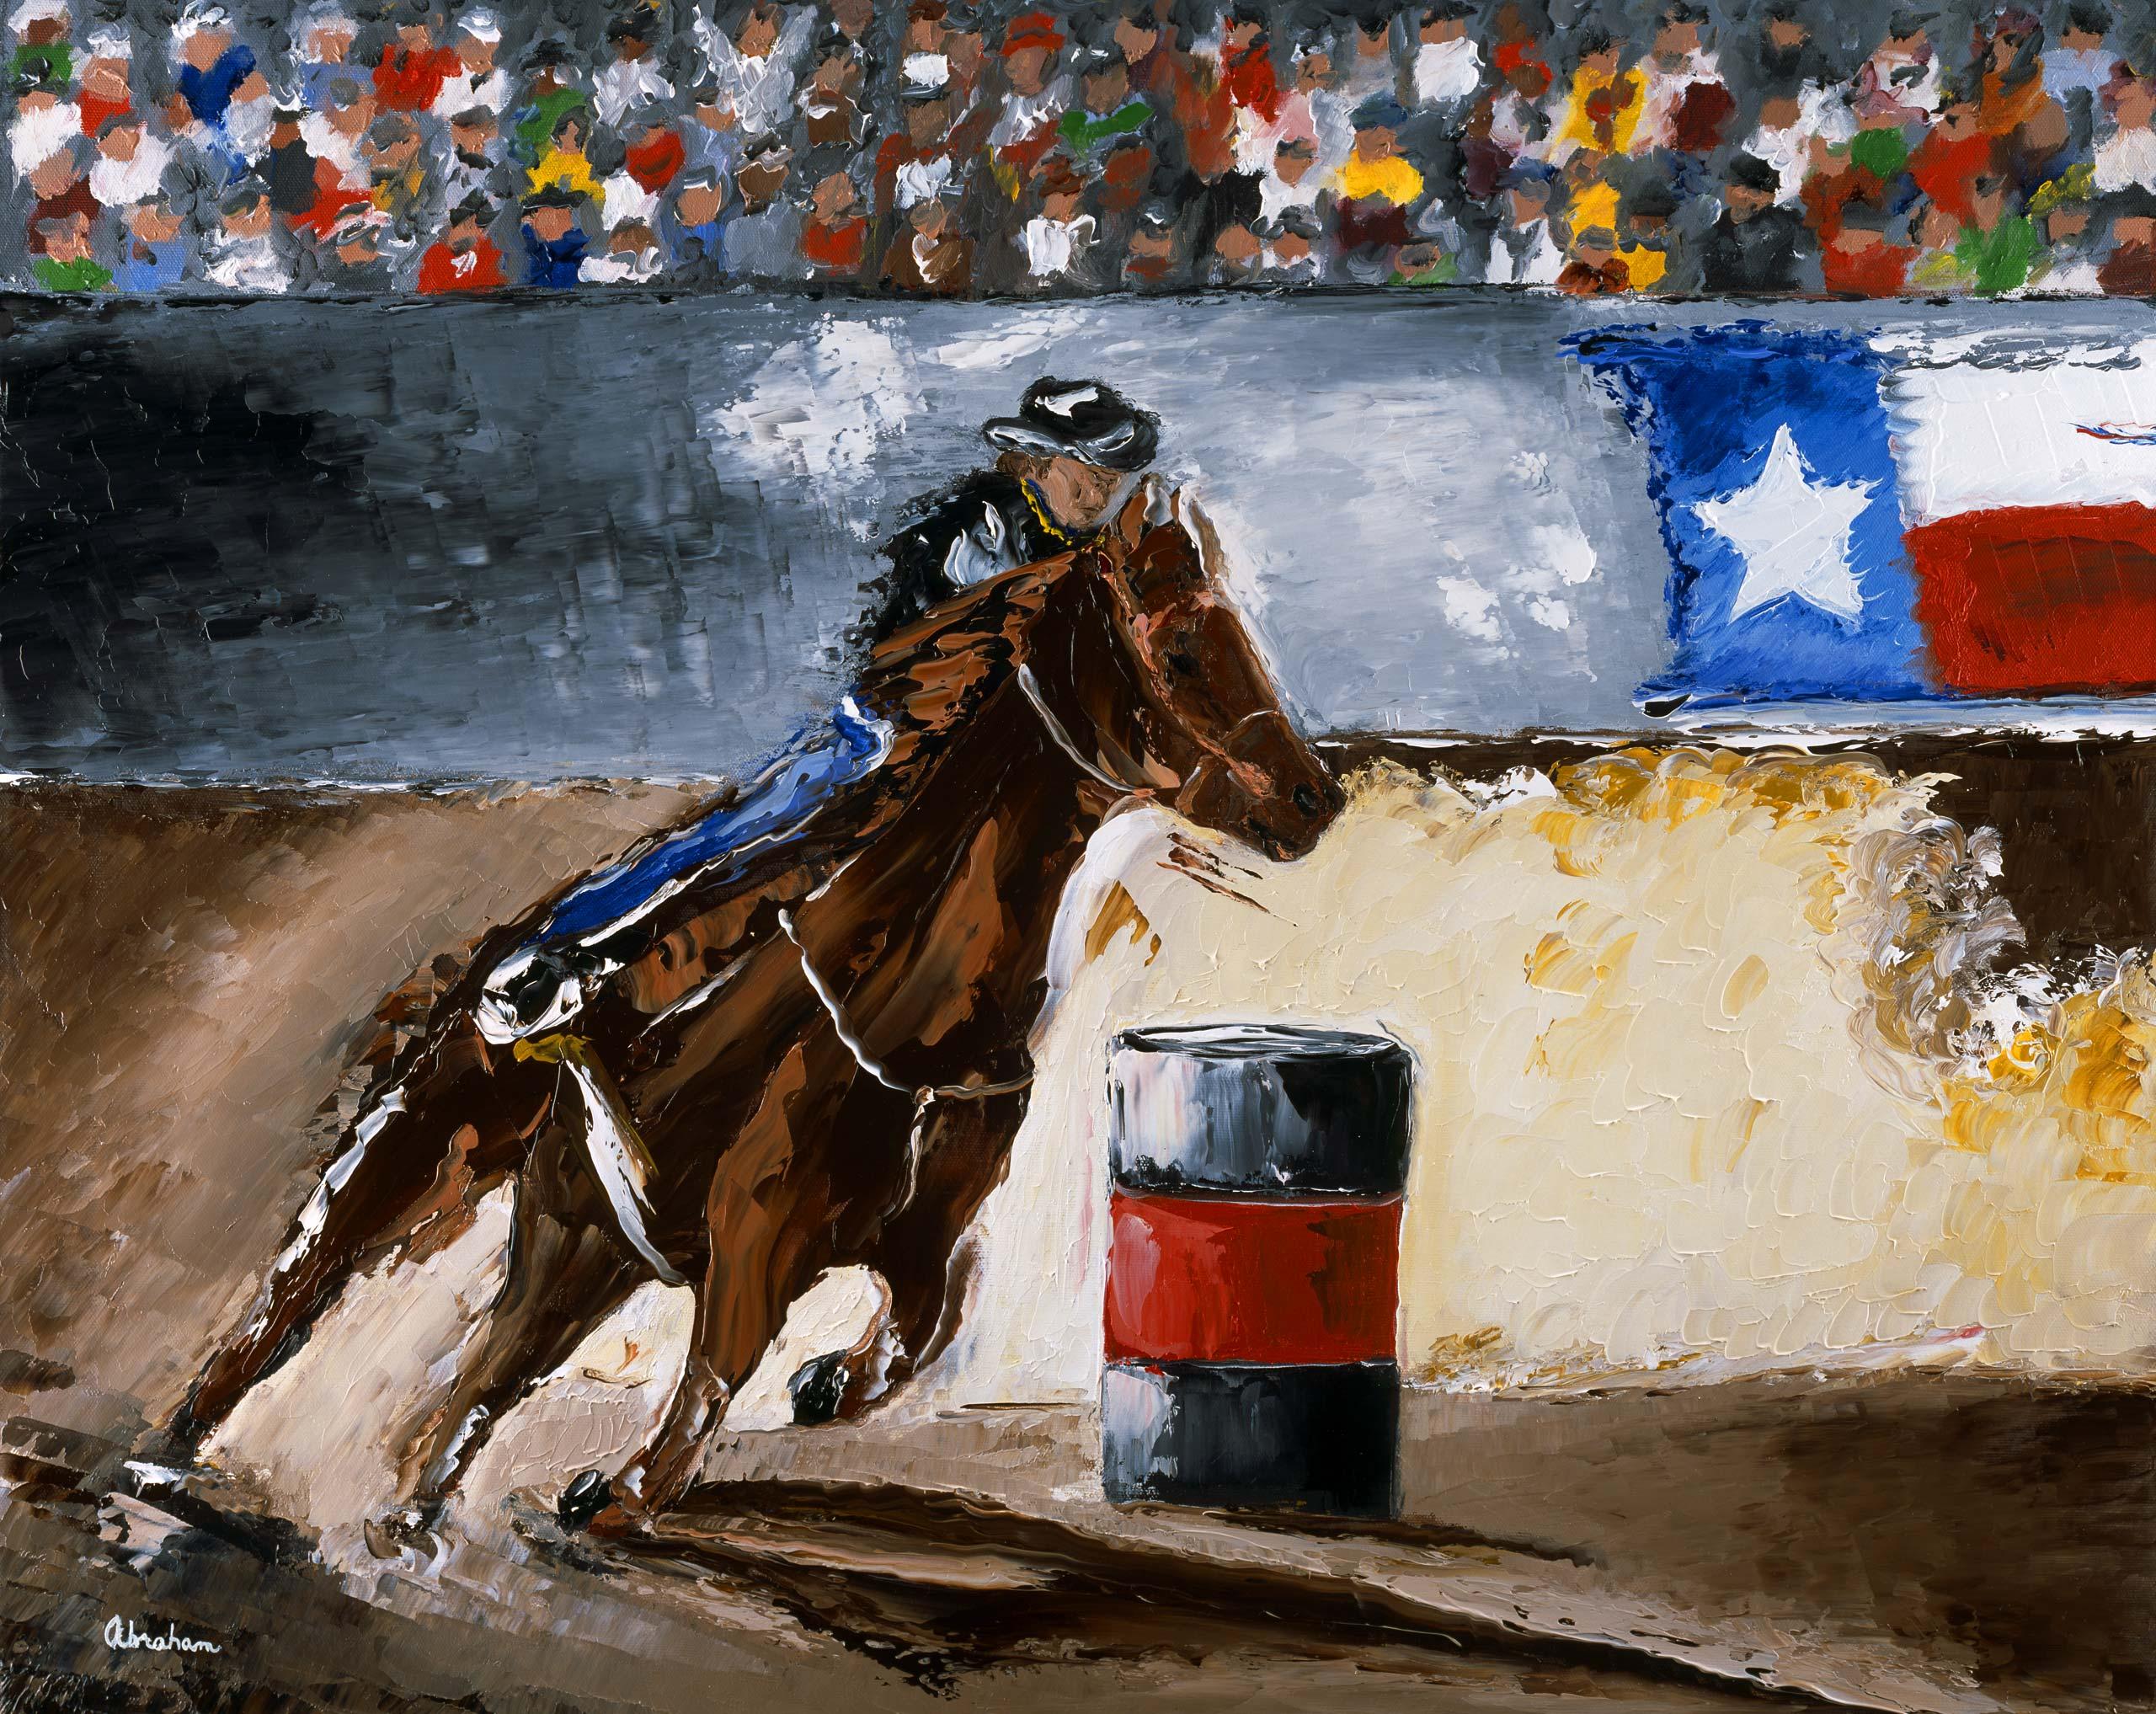 Barrel Run at the Rodeo